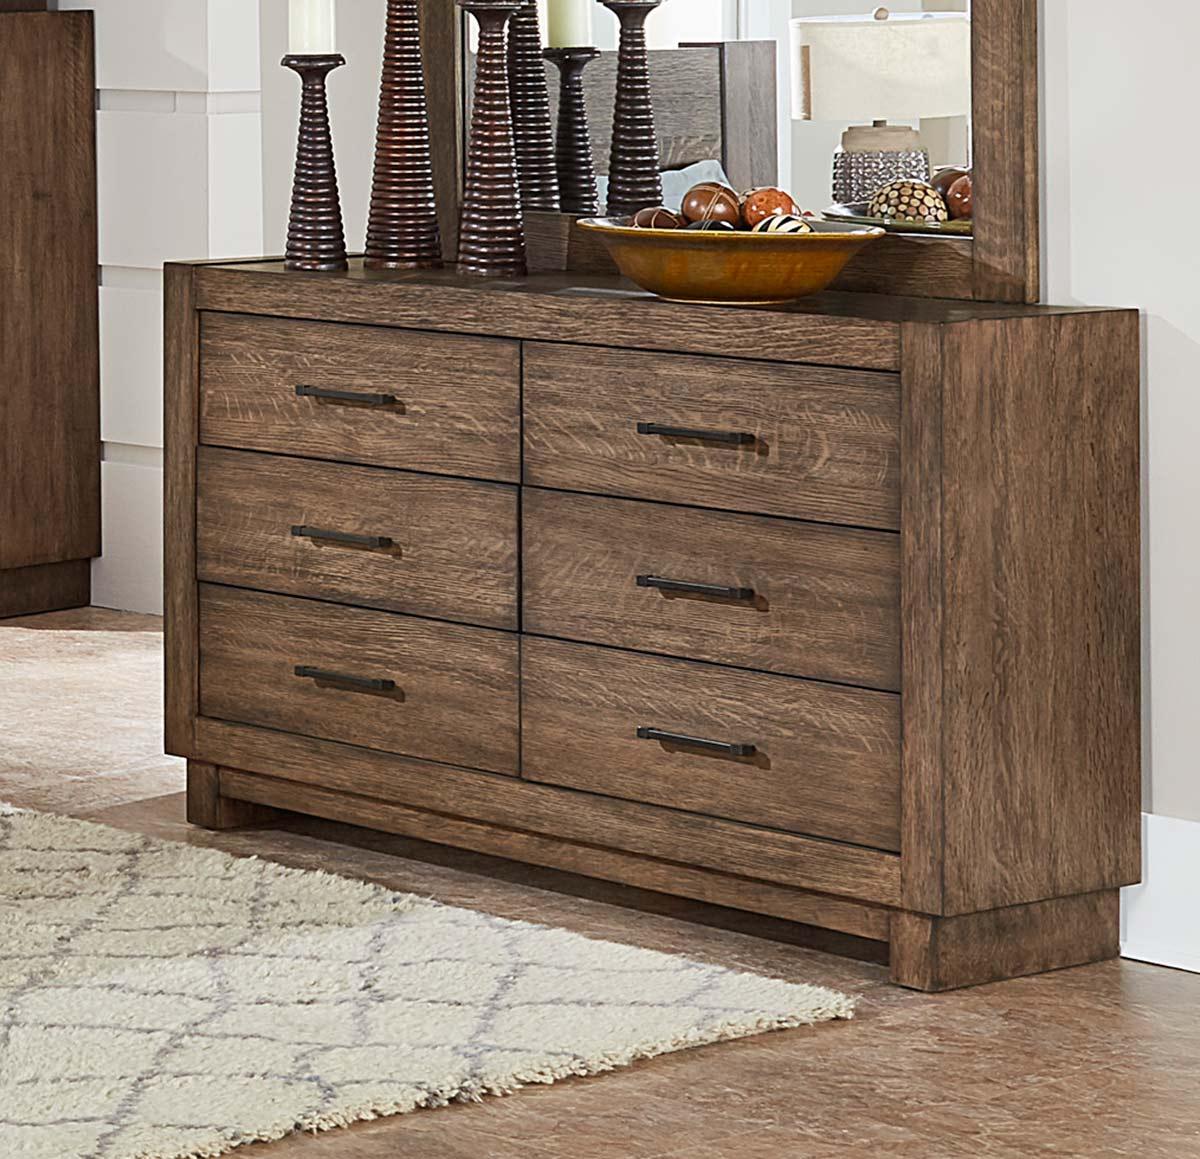 Homelegance Korlan Dresser - Brown Oak